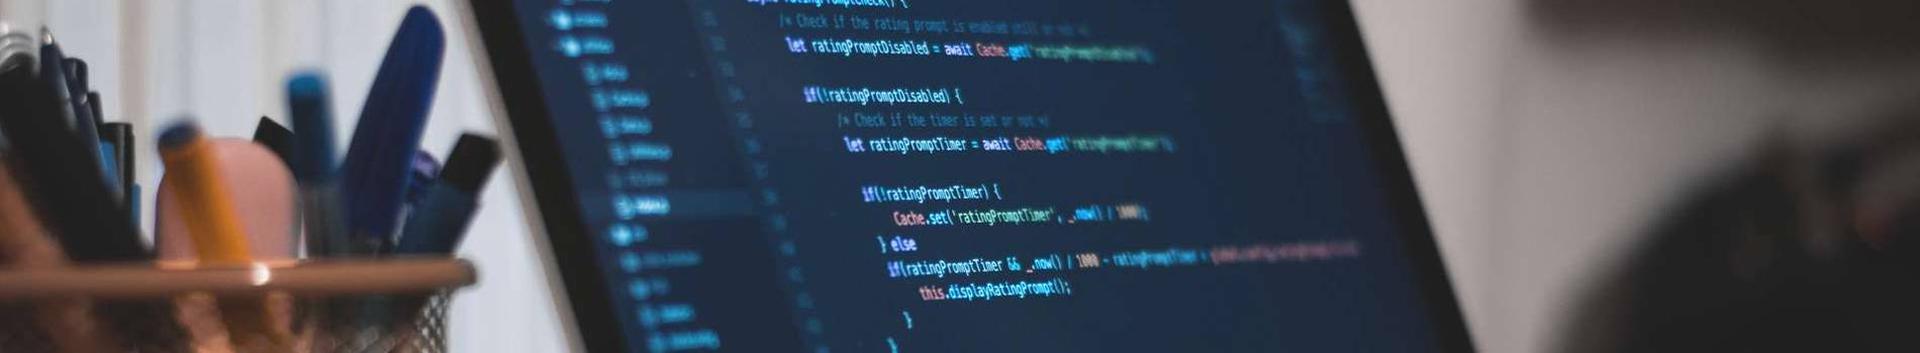 62011_programmeerimine_10343930_xl.jpg